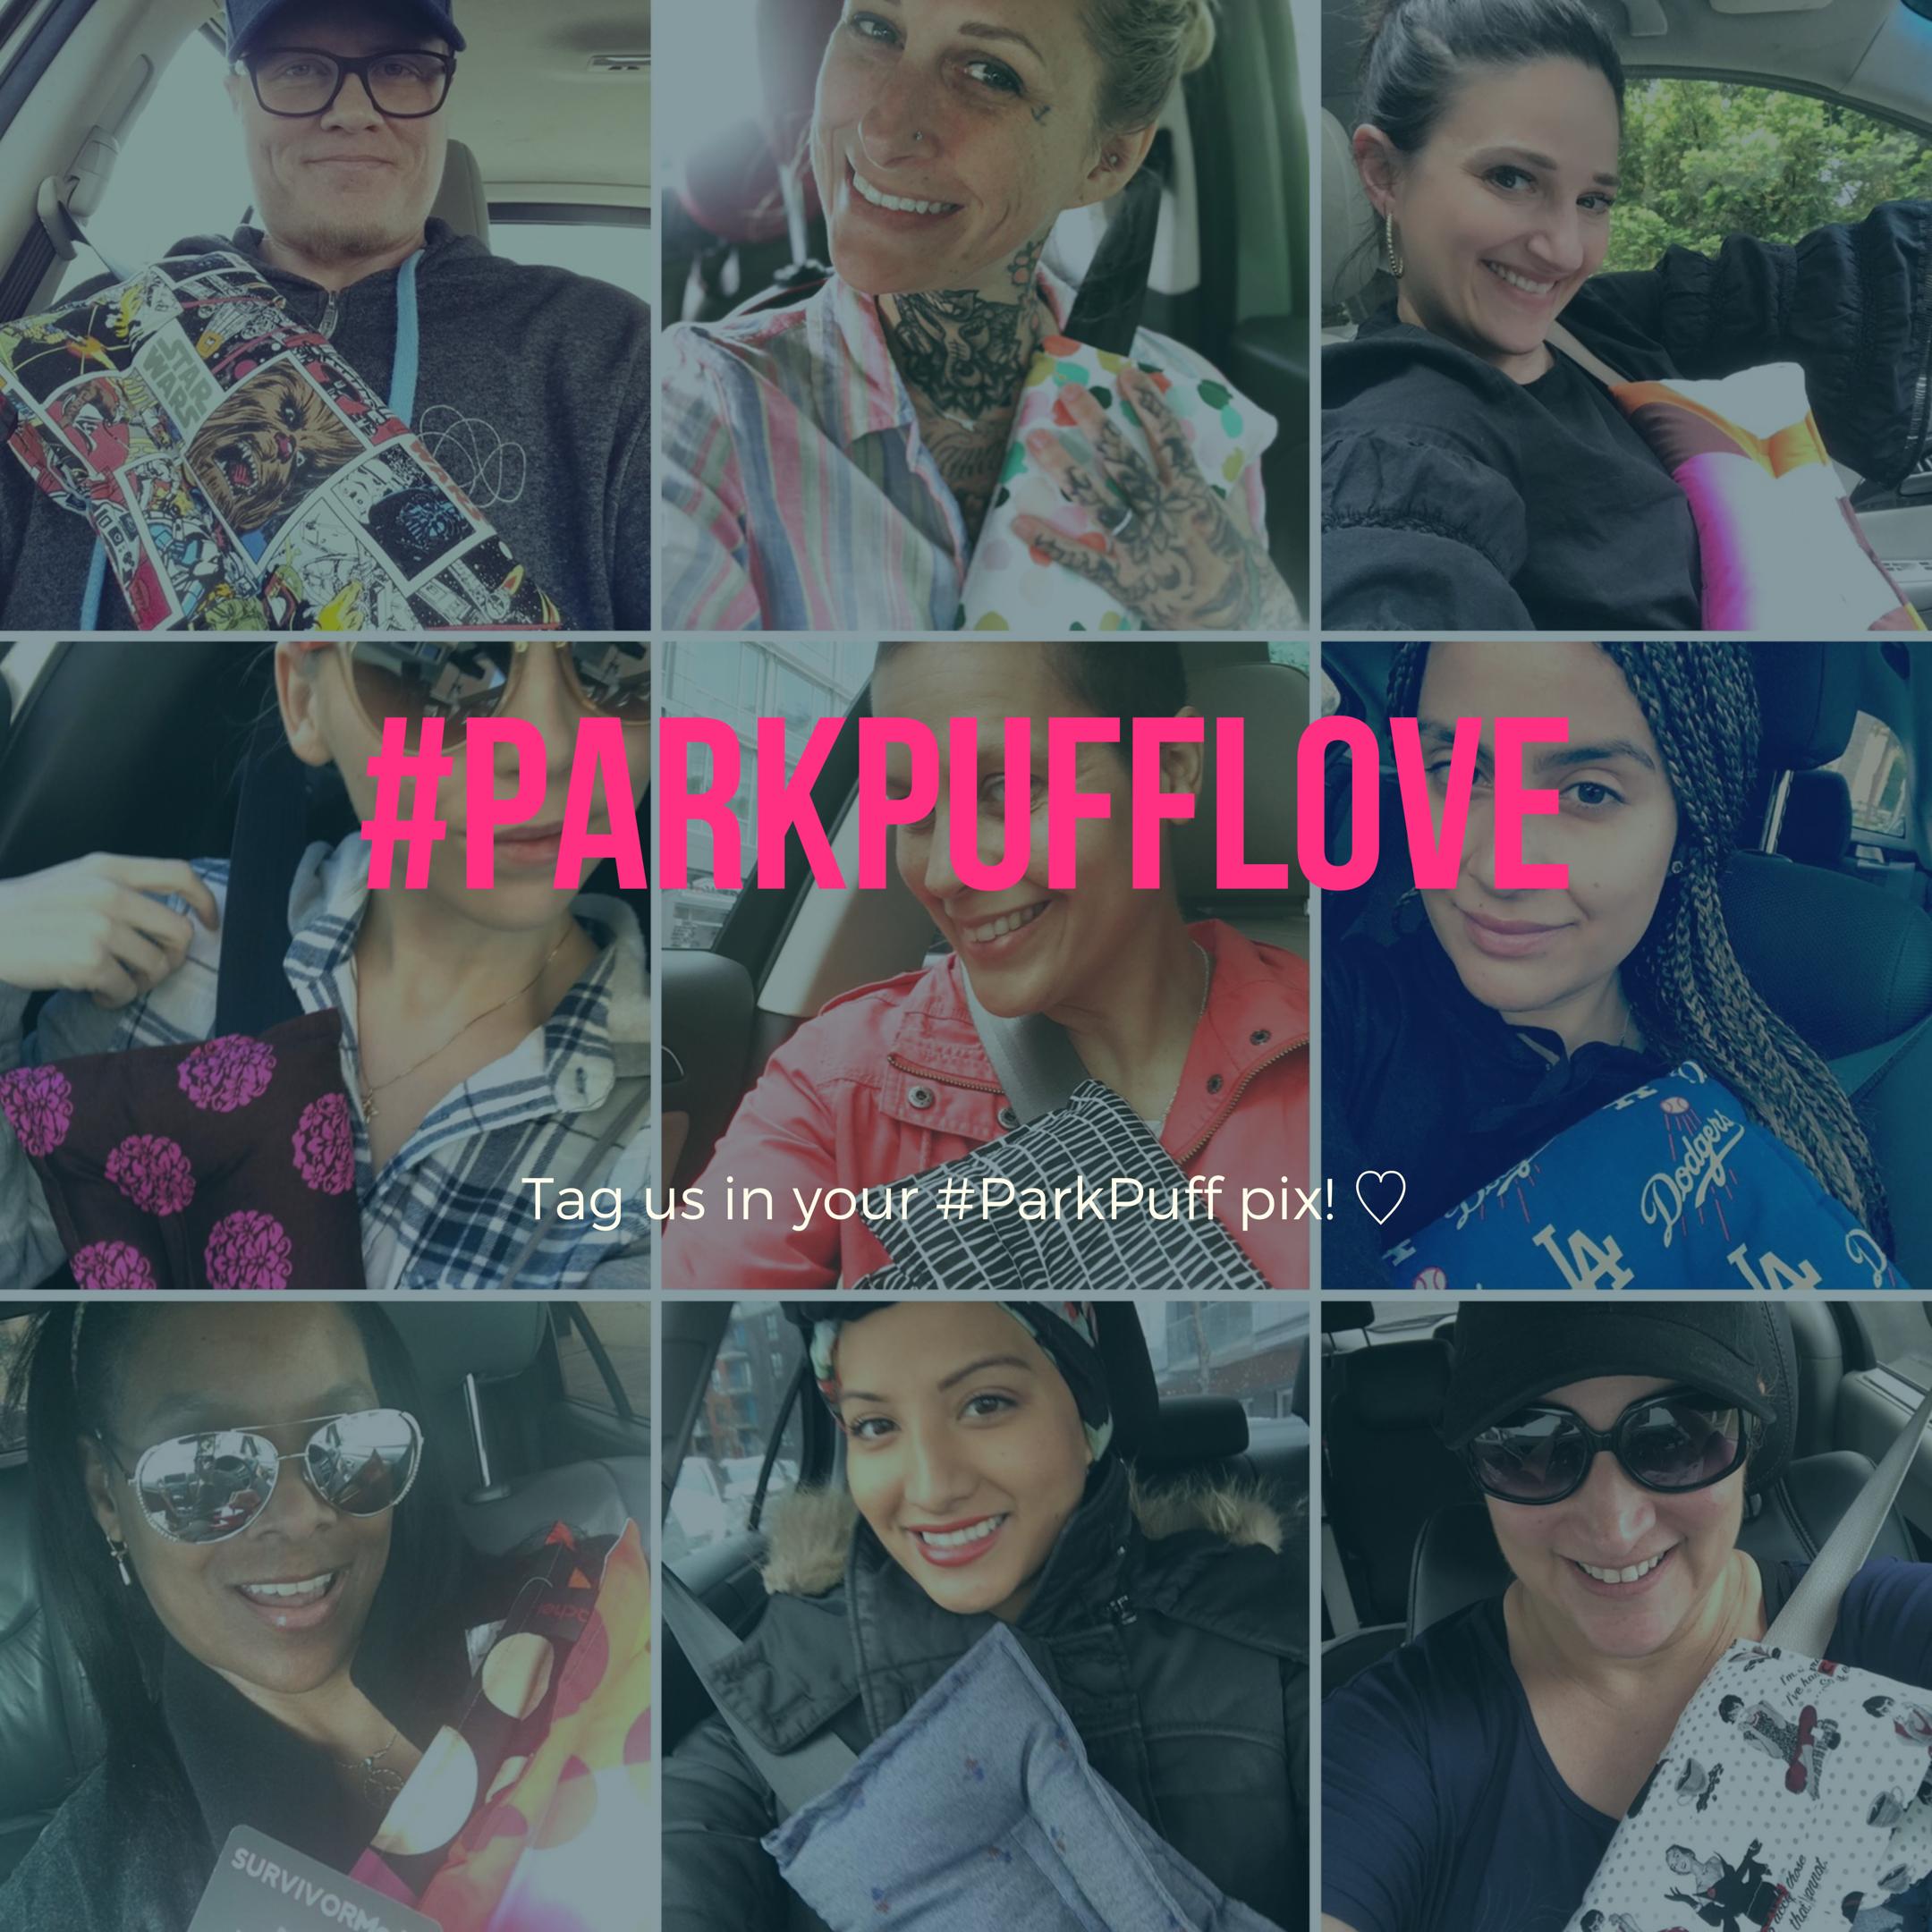 survivor-moda-rachel-park-parkpuff-love-hashtag.jpg